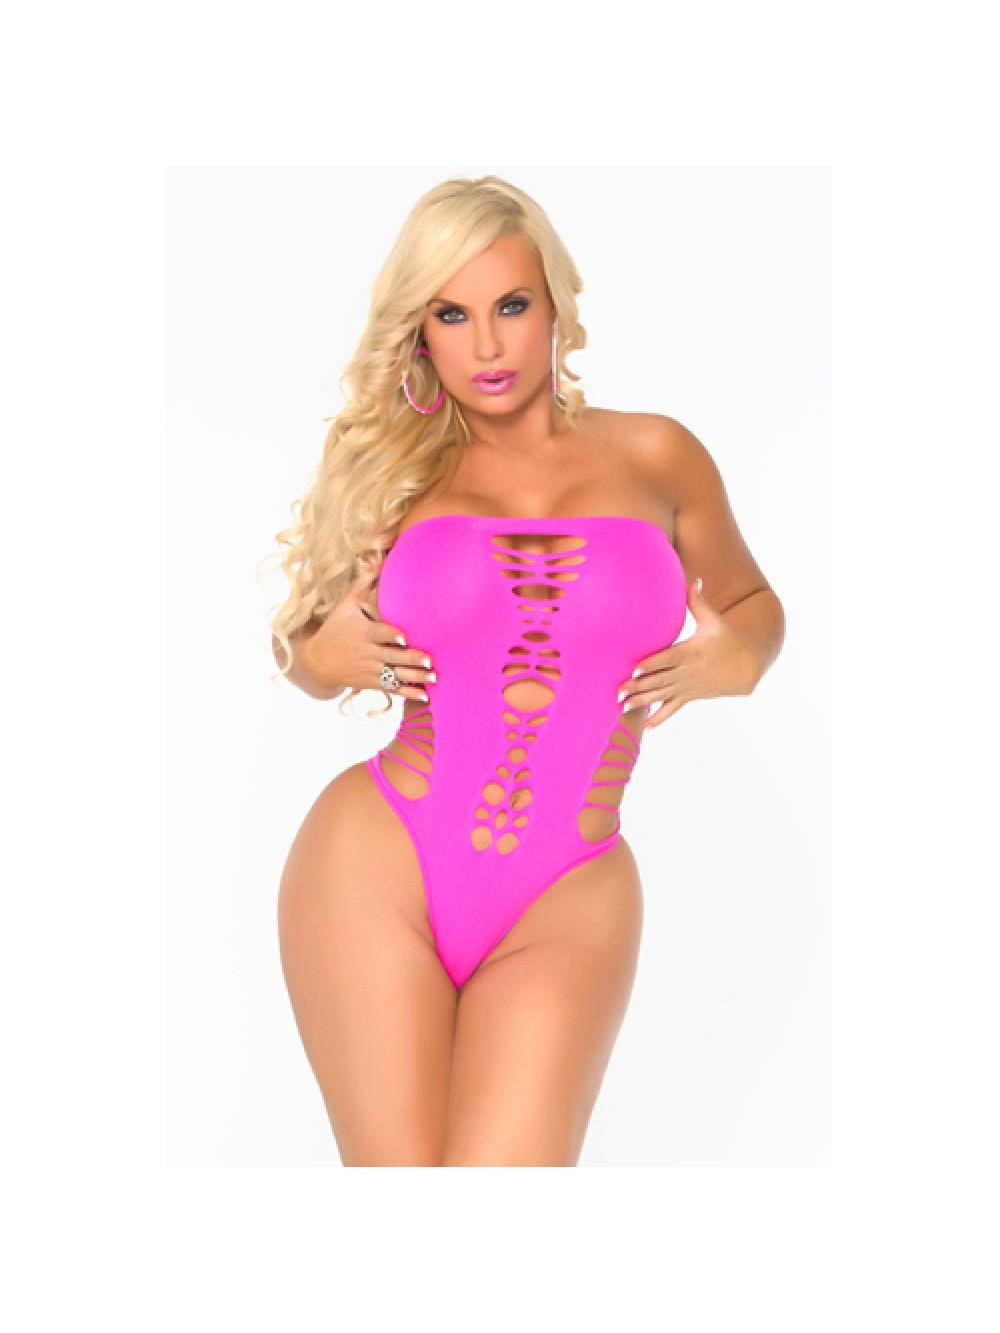 Maja Flava Seamless Bodysuit - Pink 655998353616